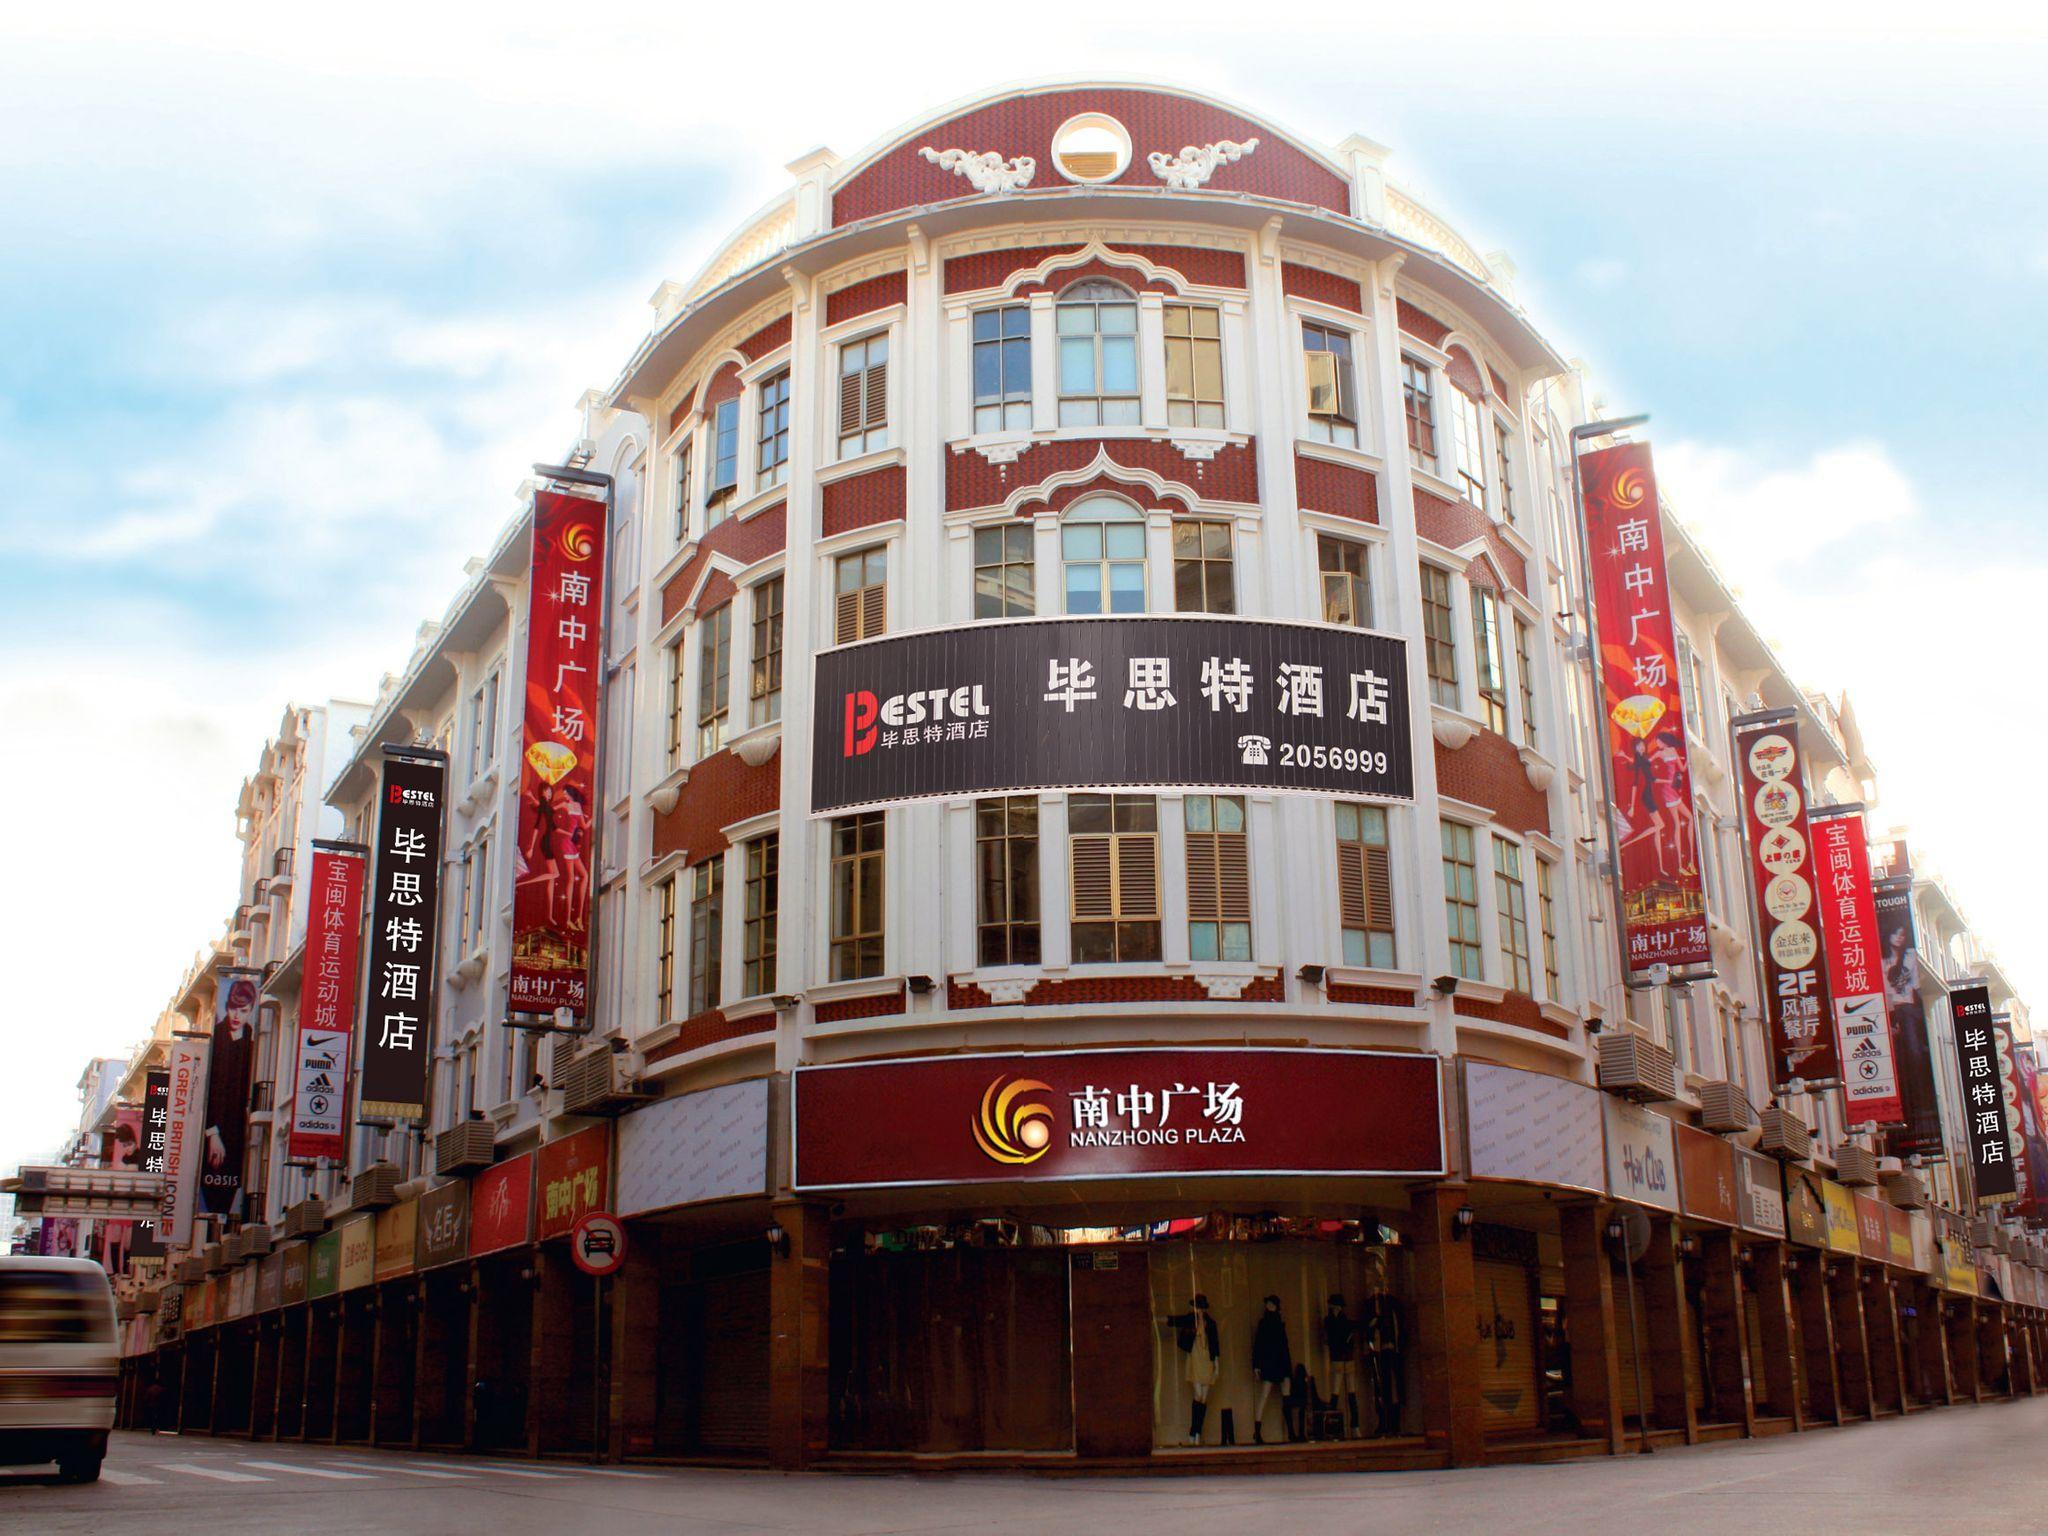 Xiamen Bestel Hotel